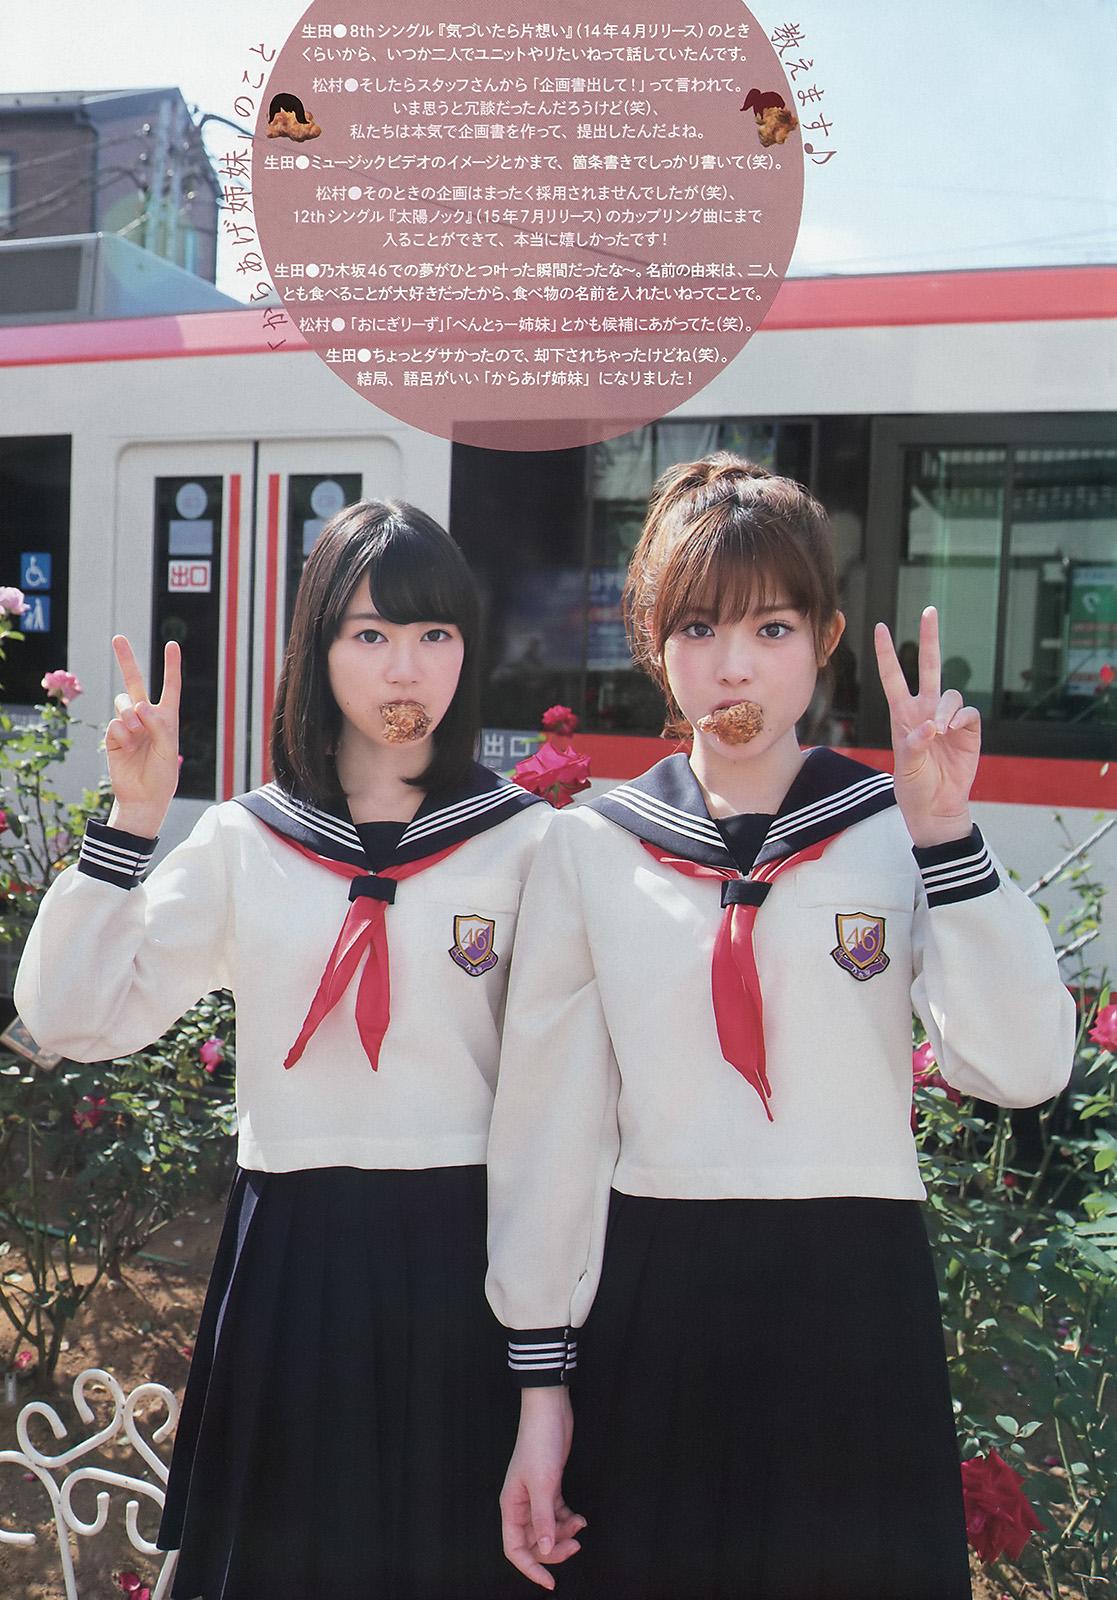 Ikuta Erika 生田絵梨花 x Matsumura Sayuri 松村沙友理 Big Comic Spirits 2016 No 3 Pics 3